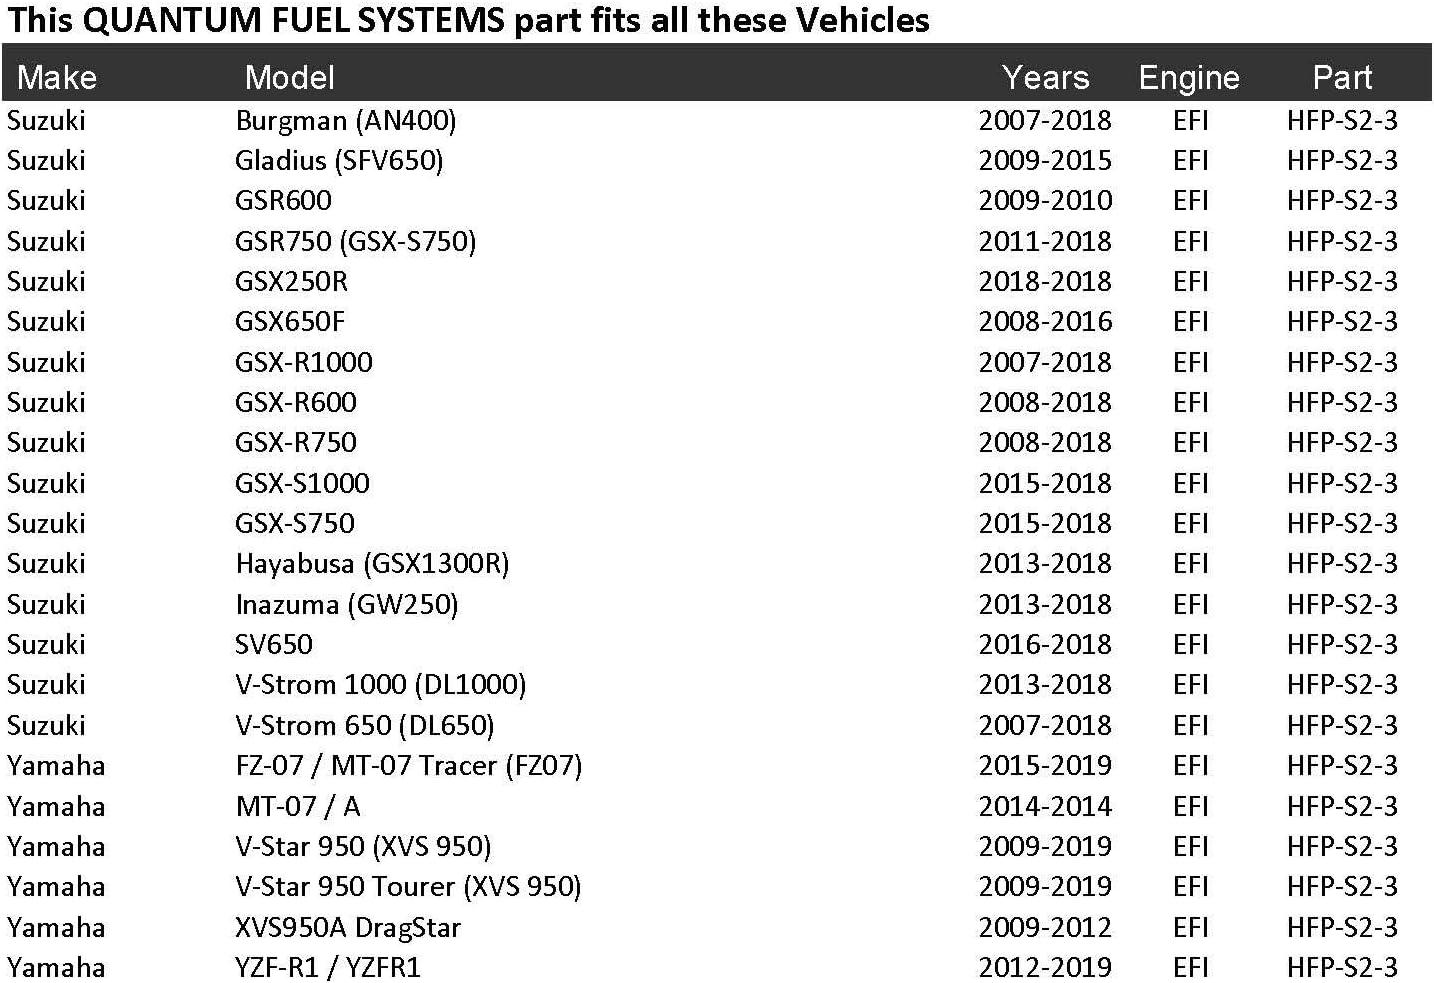 HFP-S2-3 Fuel Pump Strainer Set Replacement for Kawasaki Concours 14 Ninja 300 1000 Versys 650 1000 Vulcan 1700 900 Z ZR1000 ZG1400 ZX600 1000 1400 EX300 KLZ1000 E650 VN900 1700 EN650 2006-2019